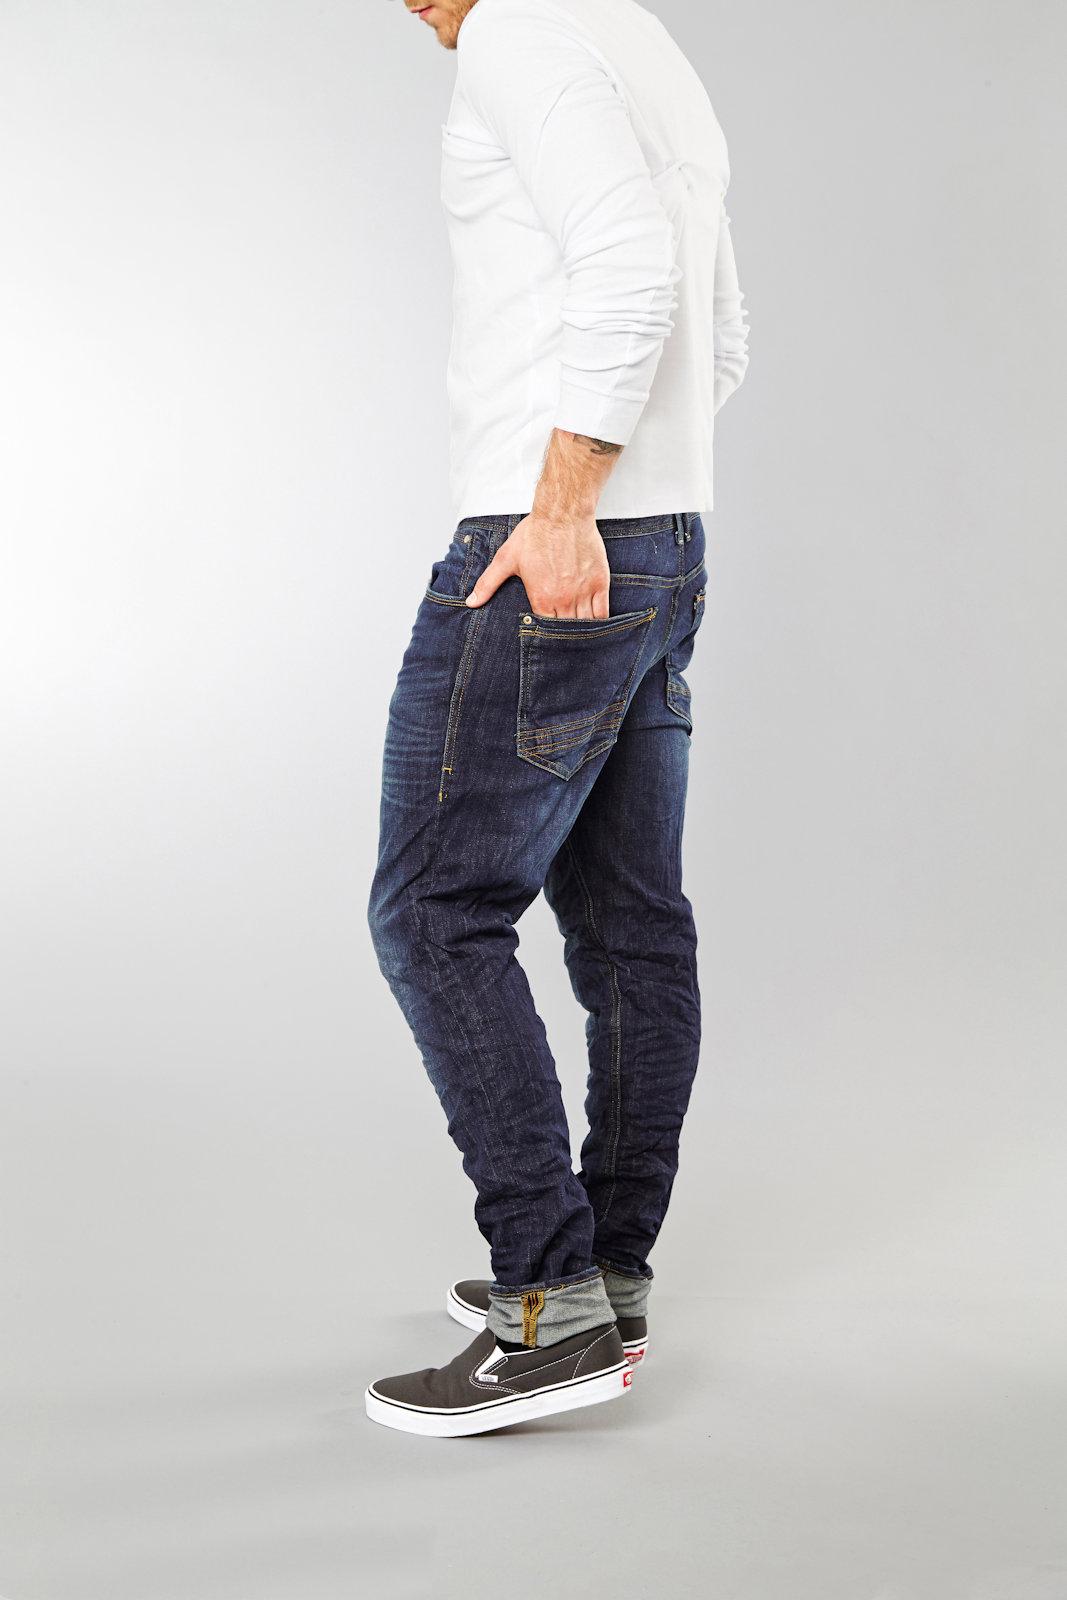 Nouveau Jupe Blend Bleu Hommes Stretch 700069 Pantalon Jeans Stretch 7q5w1q0z